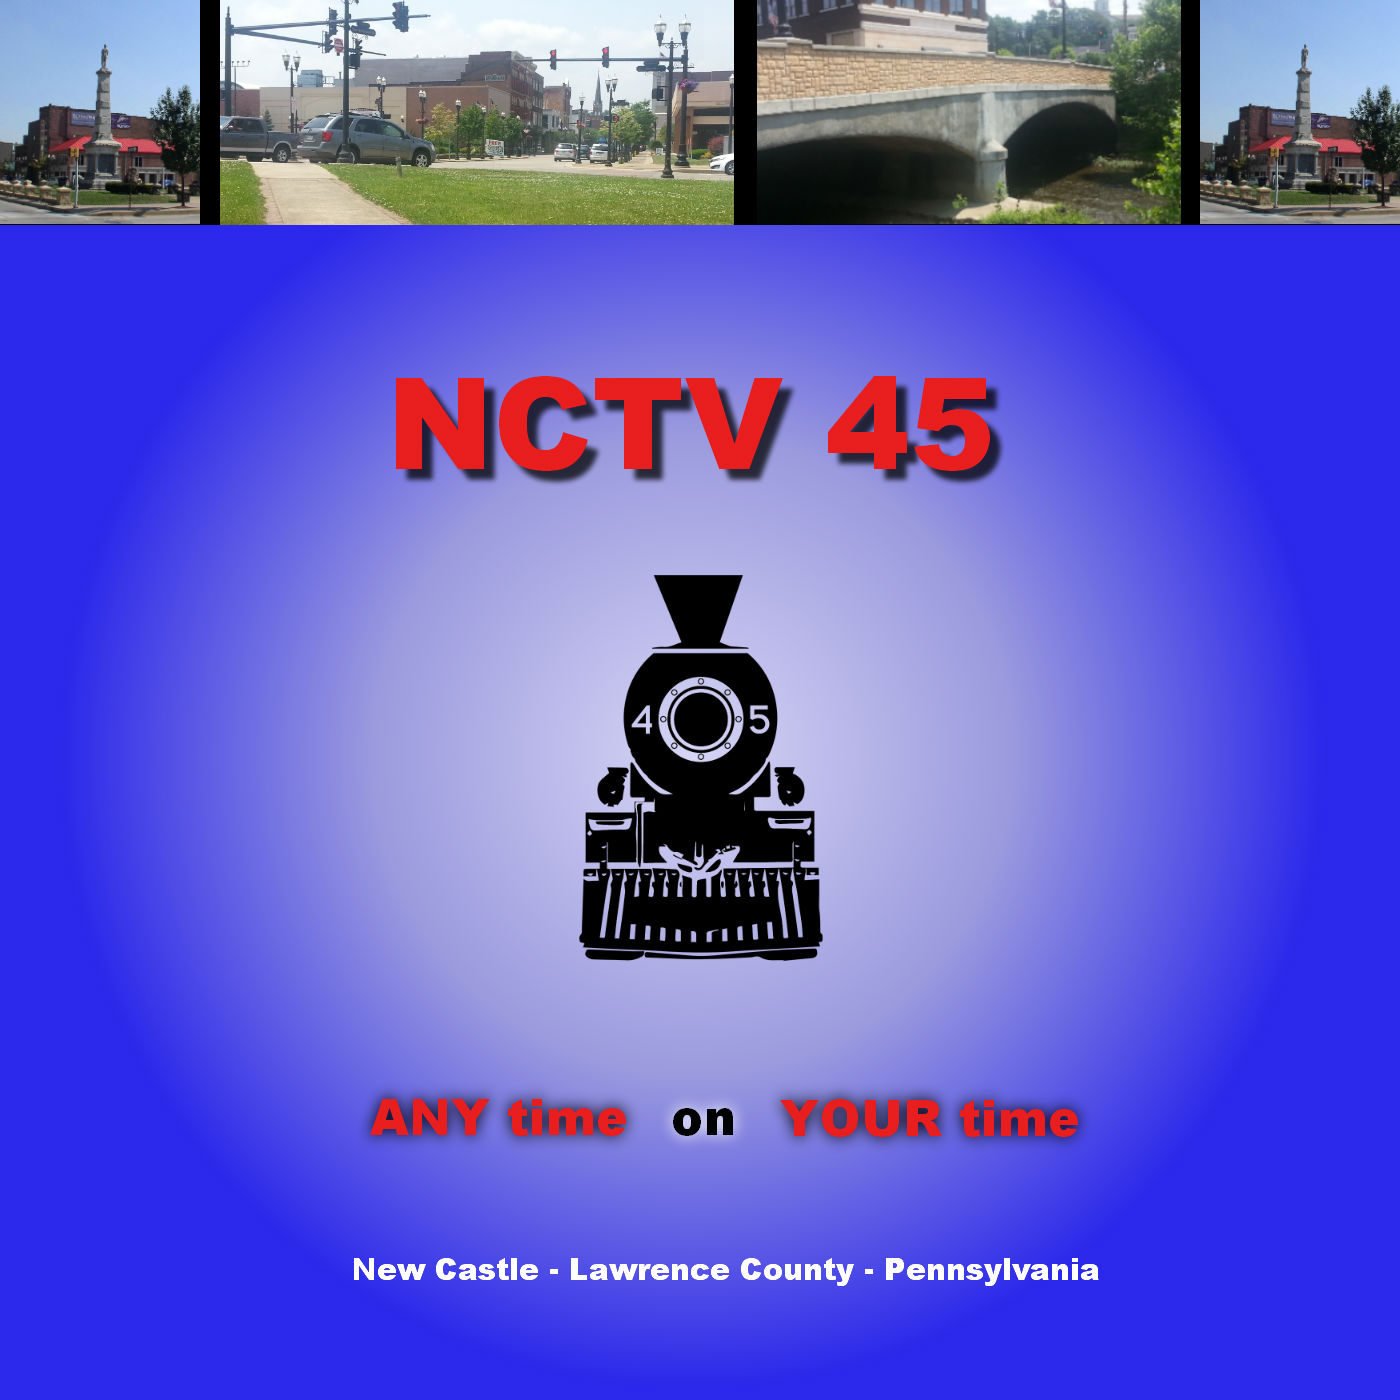 Artwork for NCTV45's Lawrence County Community Happenings Jan 20 Thru 26th 2019